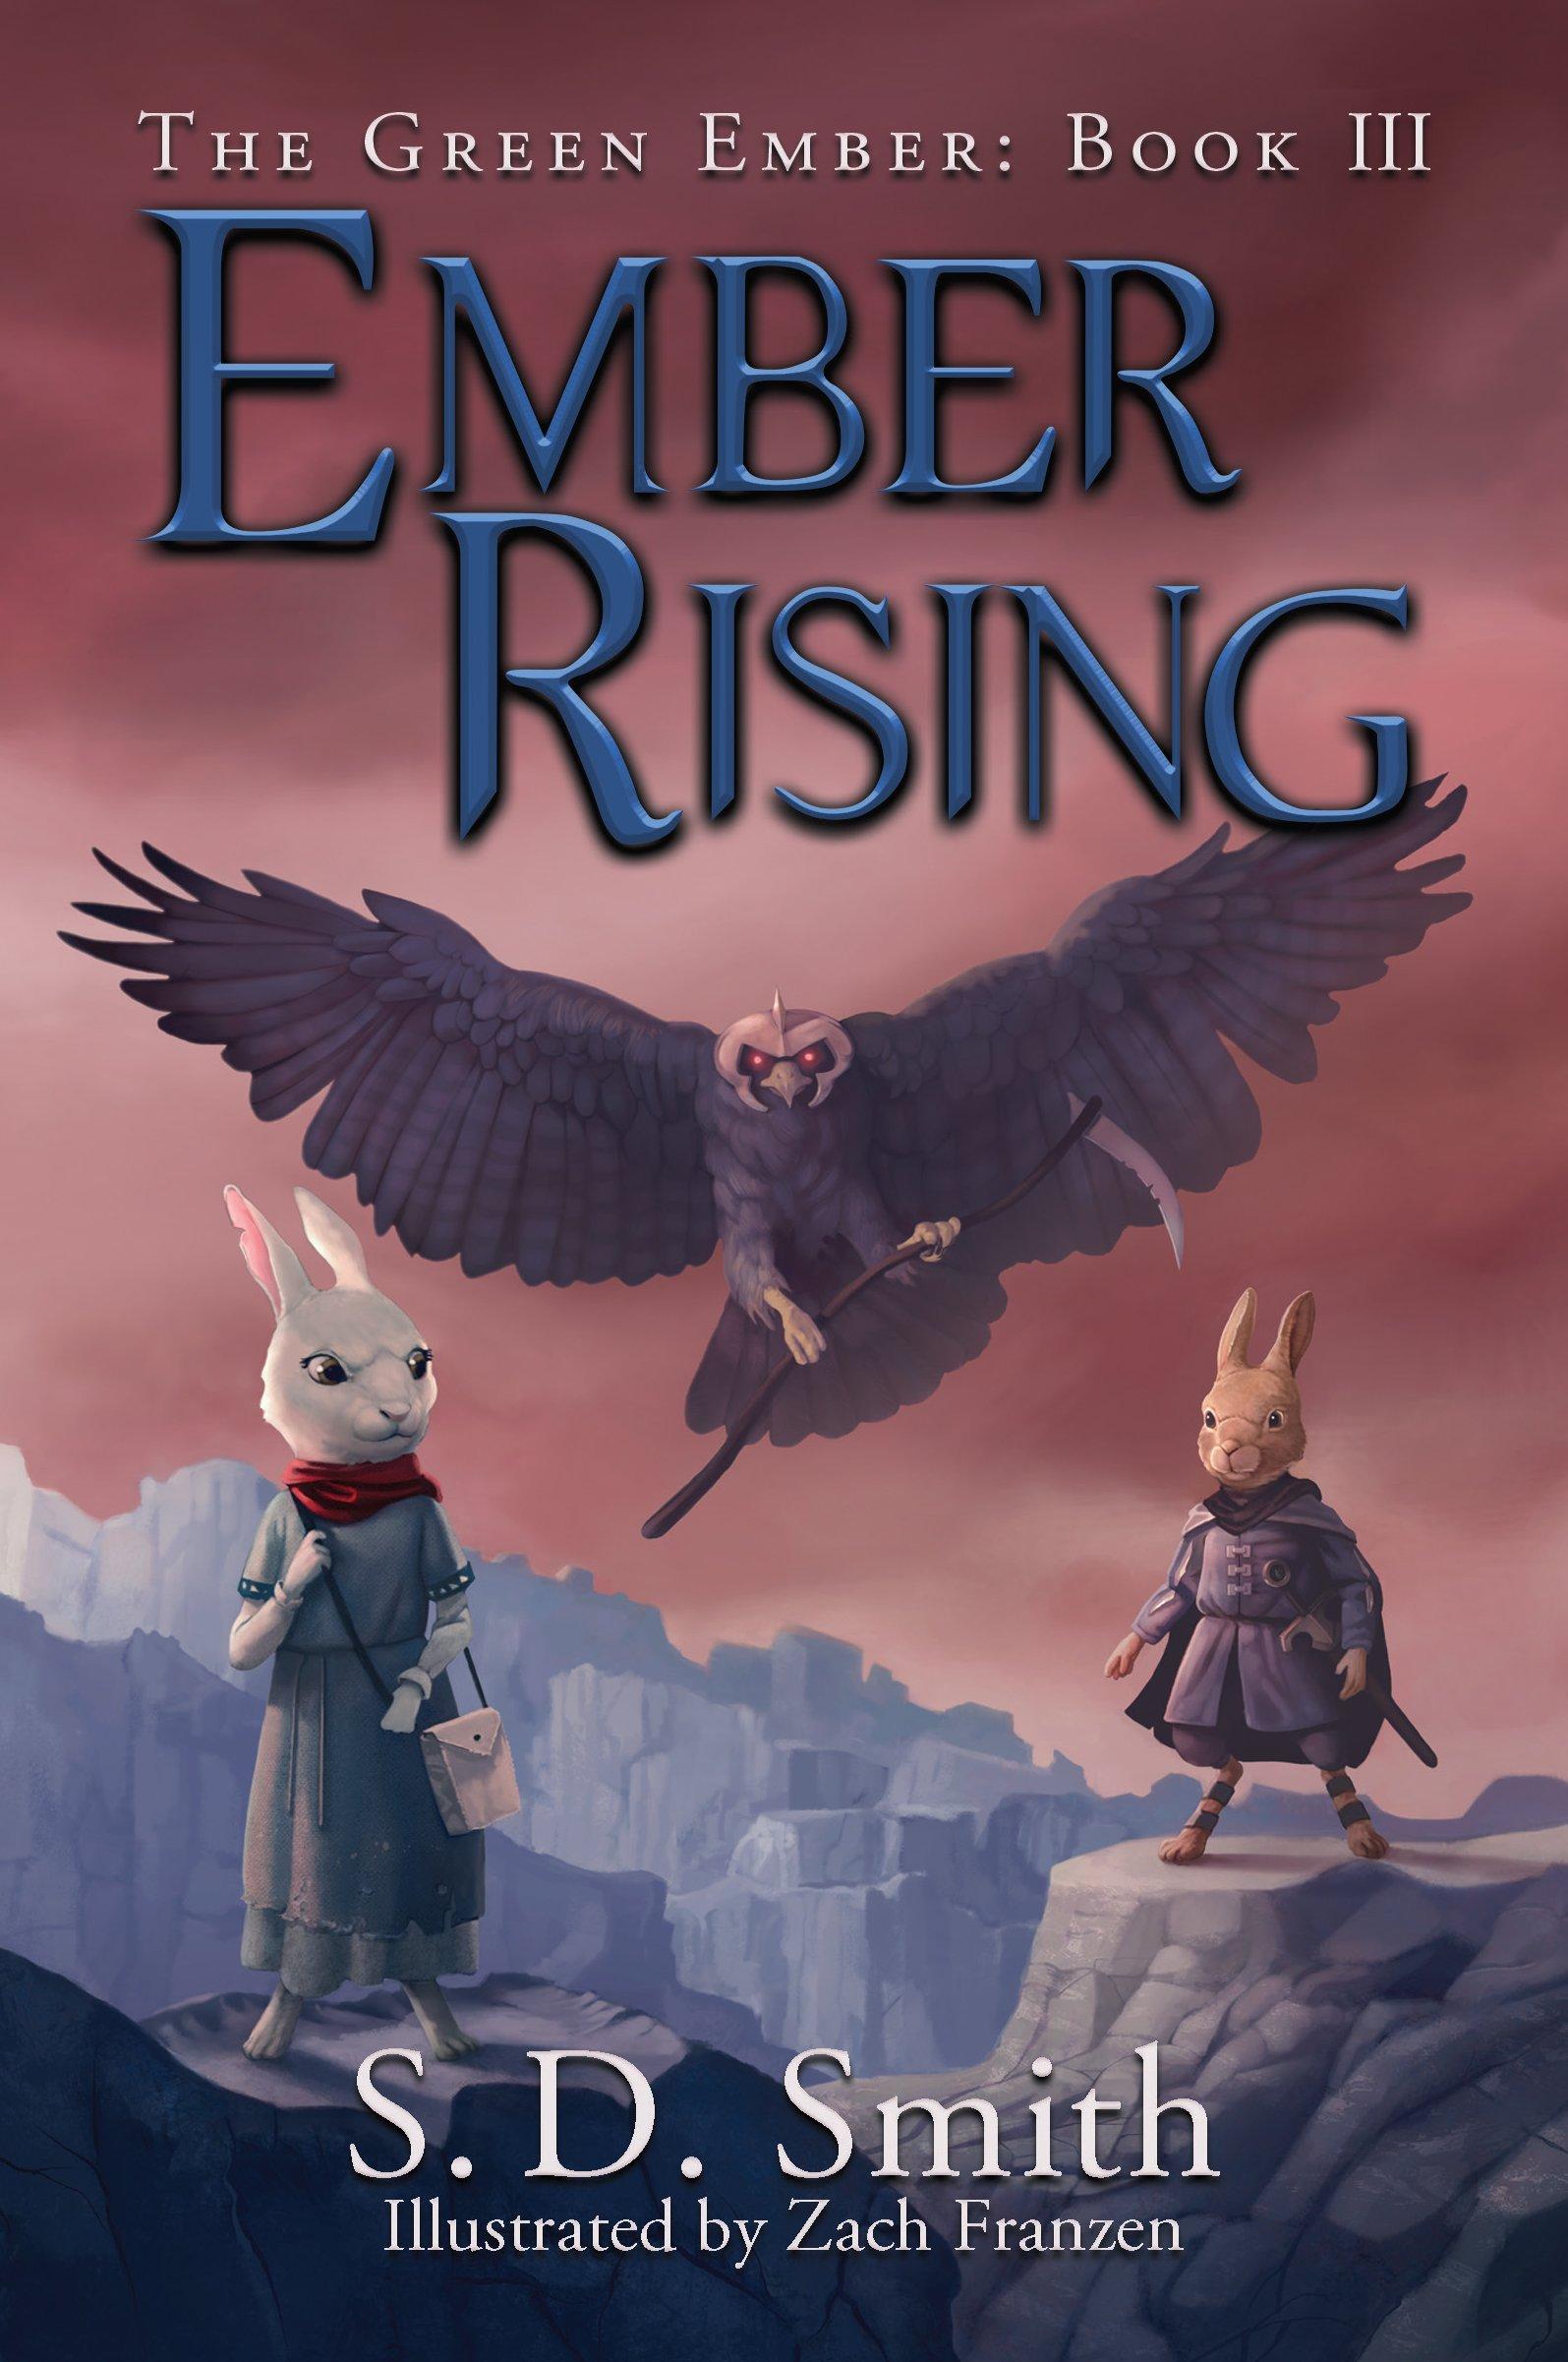 Image result for ember rising